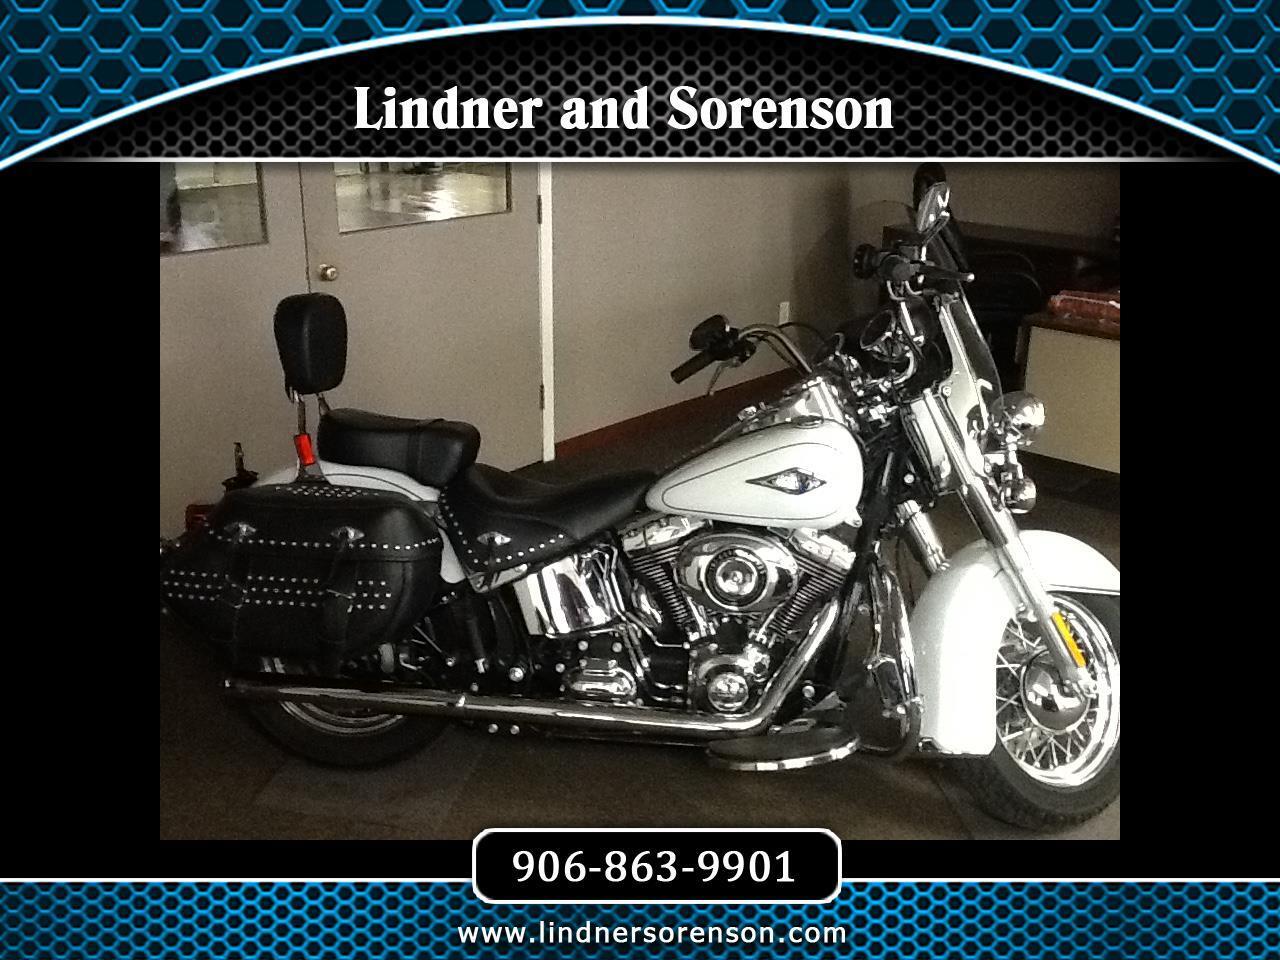 2013 Harley-Davidson FLSTCI Heritage Softail